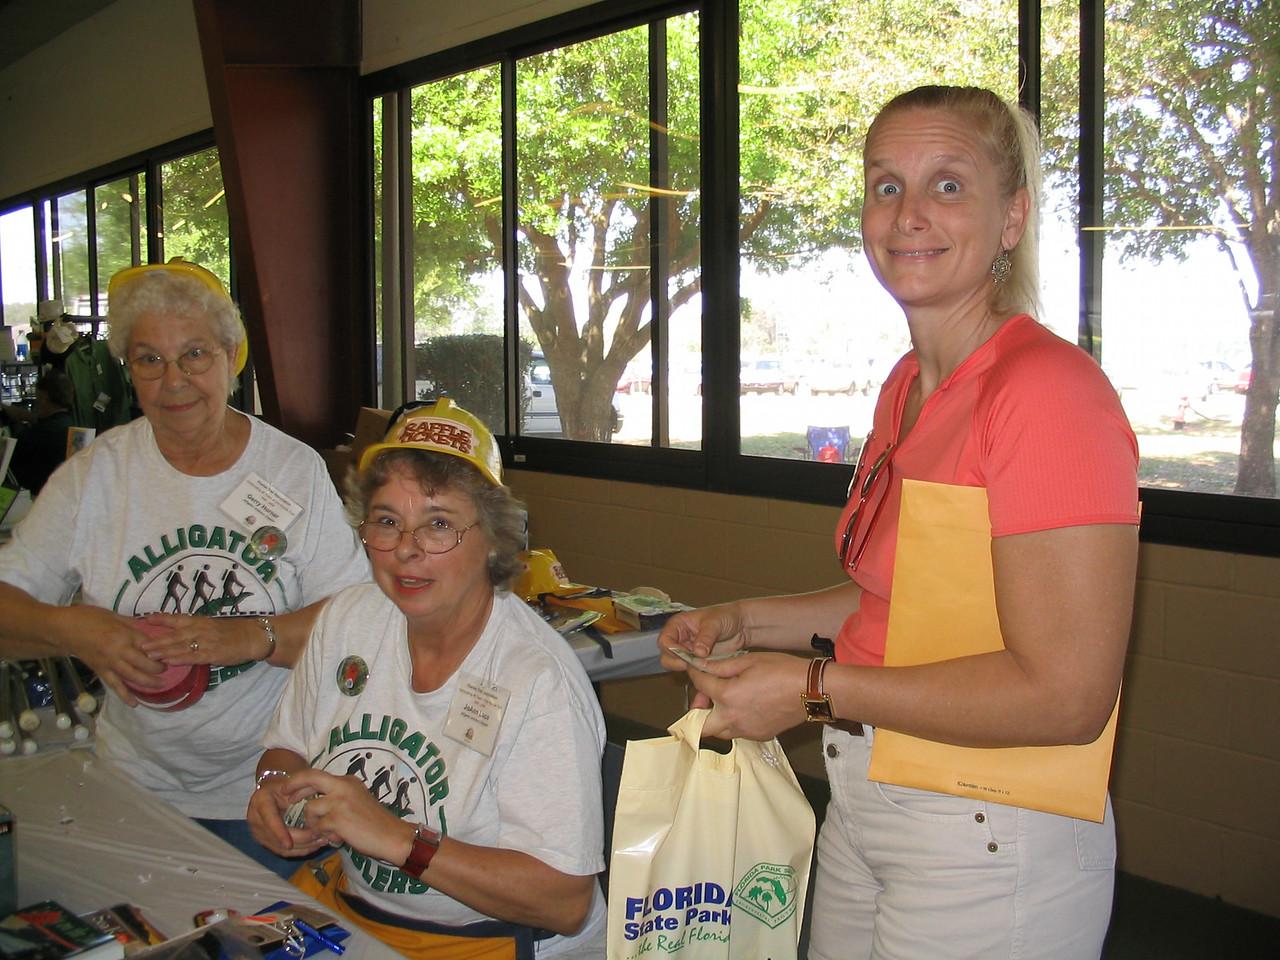 Amblers hard at work selling raffle tickets!<br /> PHOTO CREDIT: Diane Wilkins / Florida Trail Association